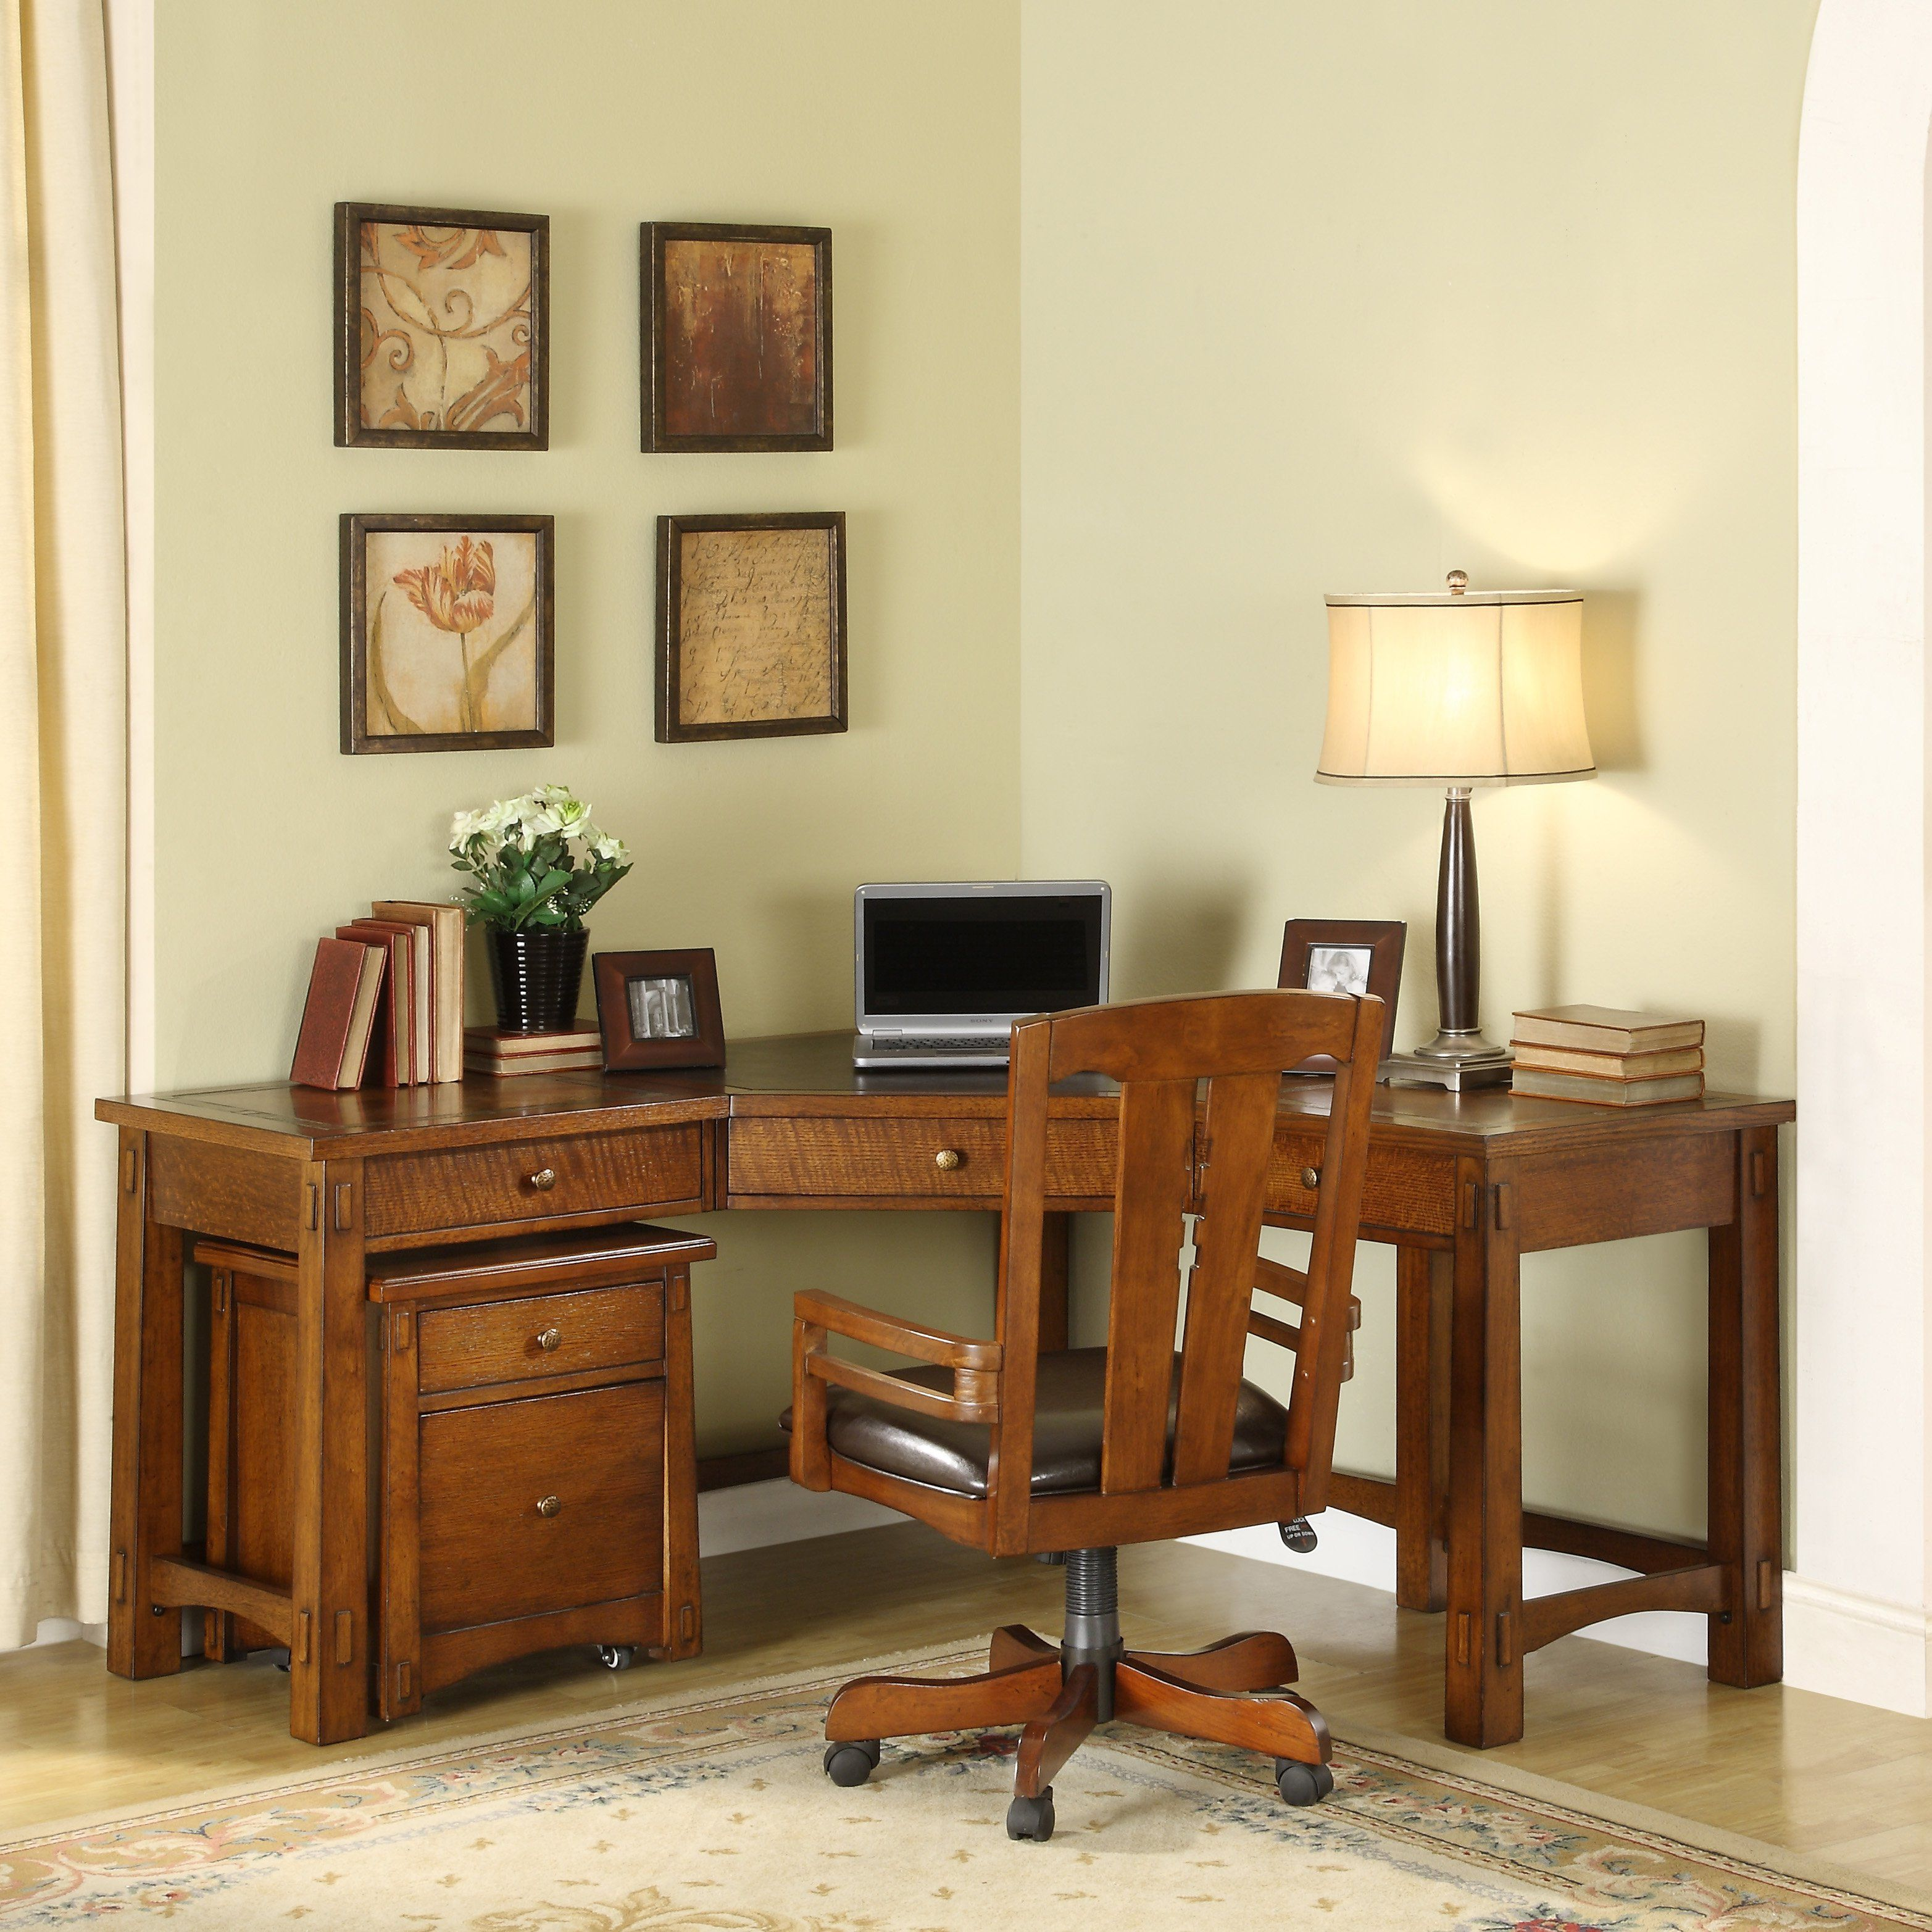 99 Mission Oak Corner Desk Rustic Home Office Furniture Check More At Http